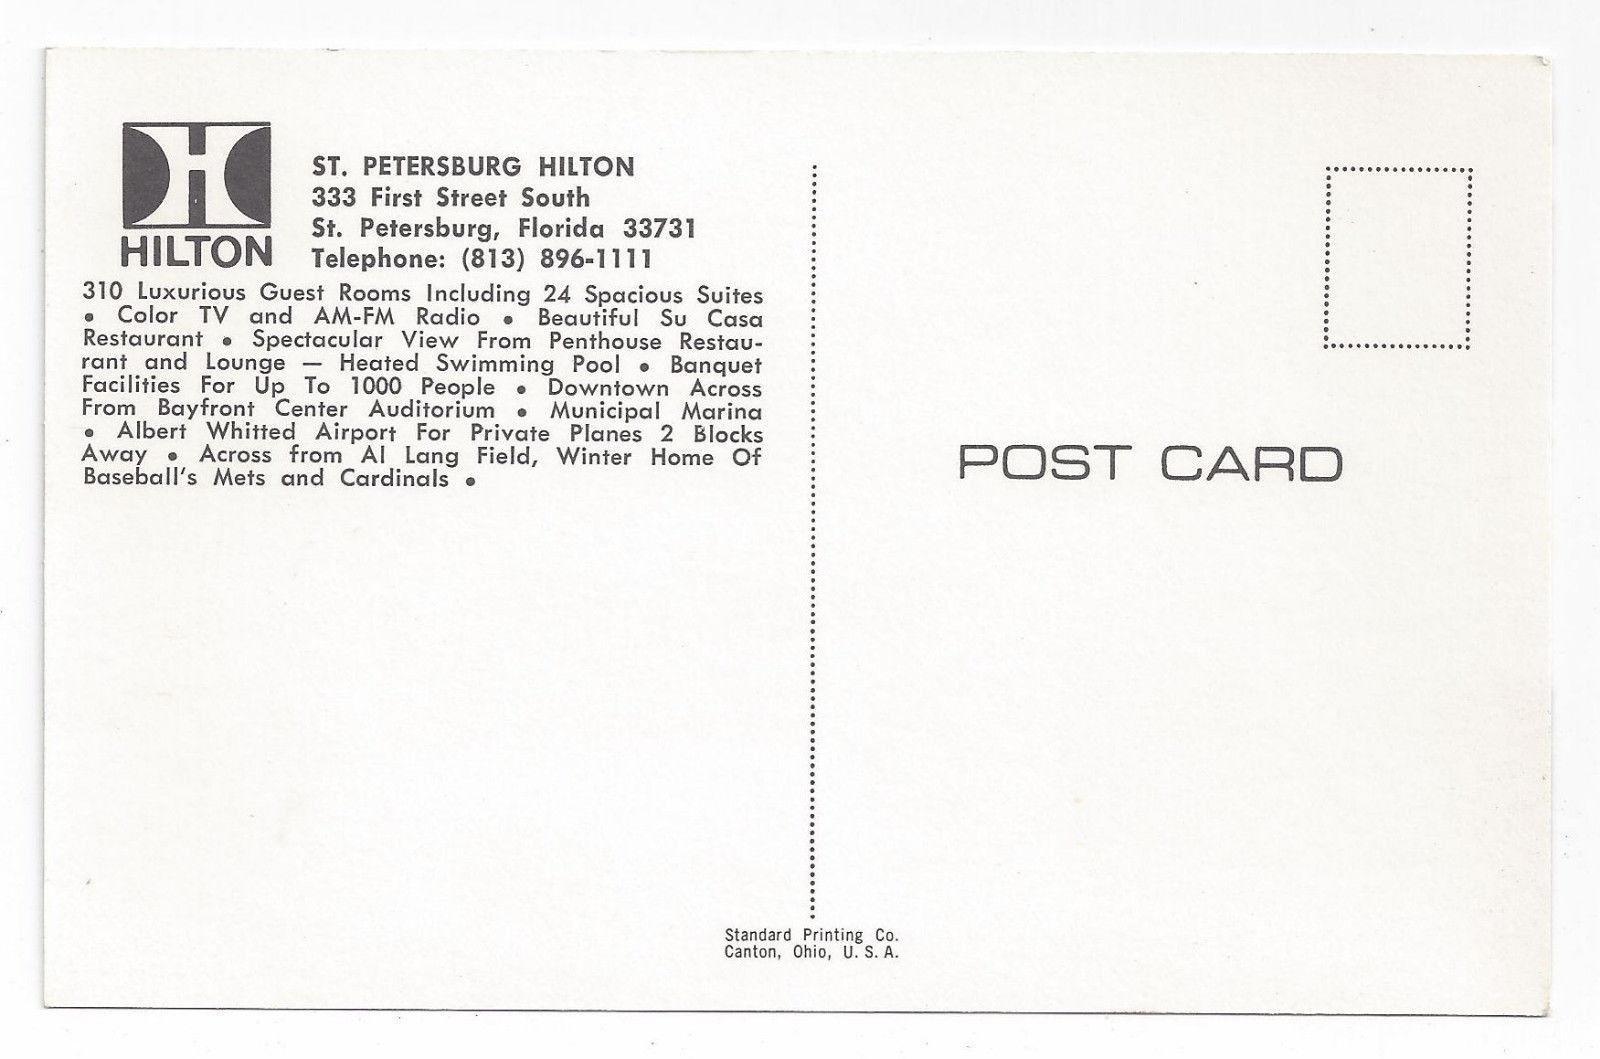 FL St Petersburg Hilton Hotel Marina Boats Vintage Postcard